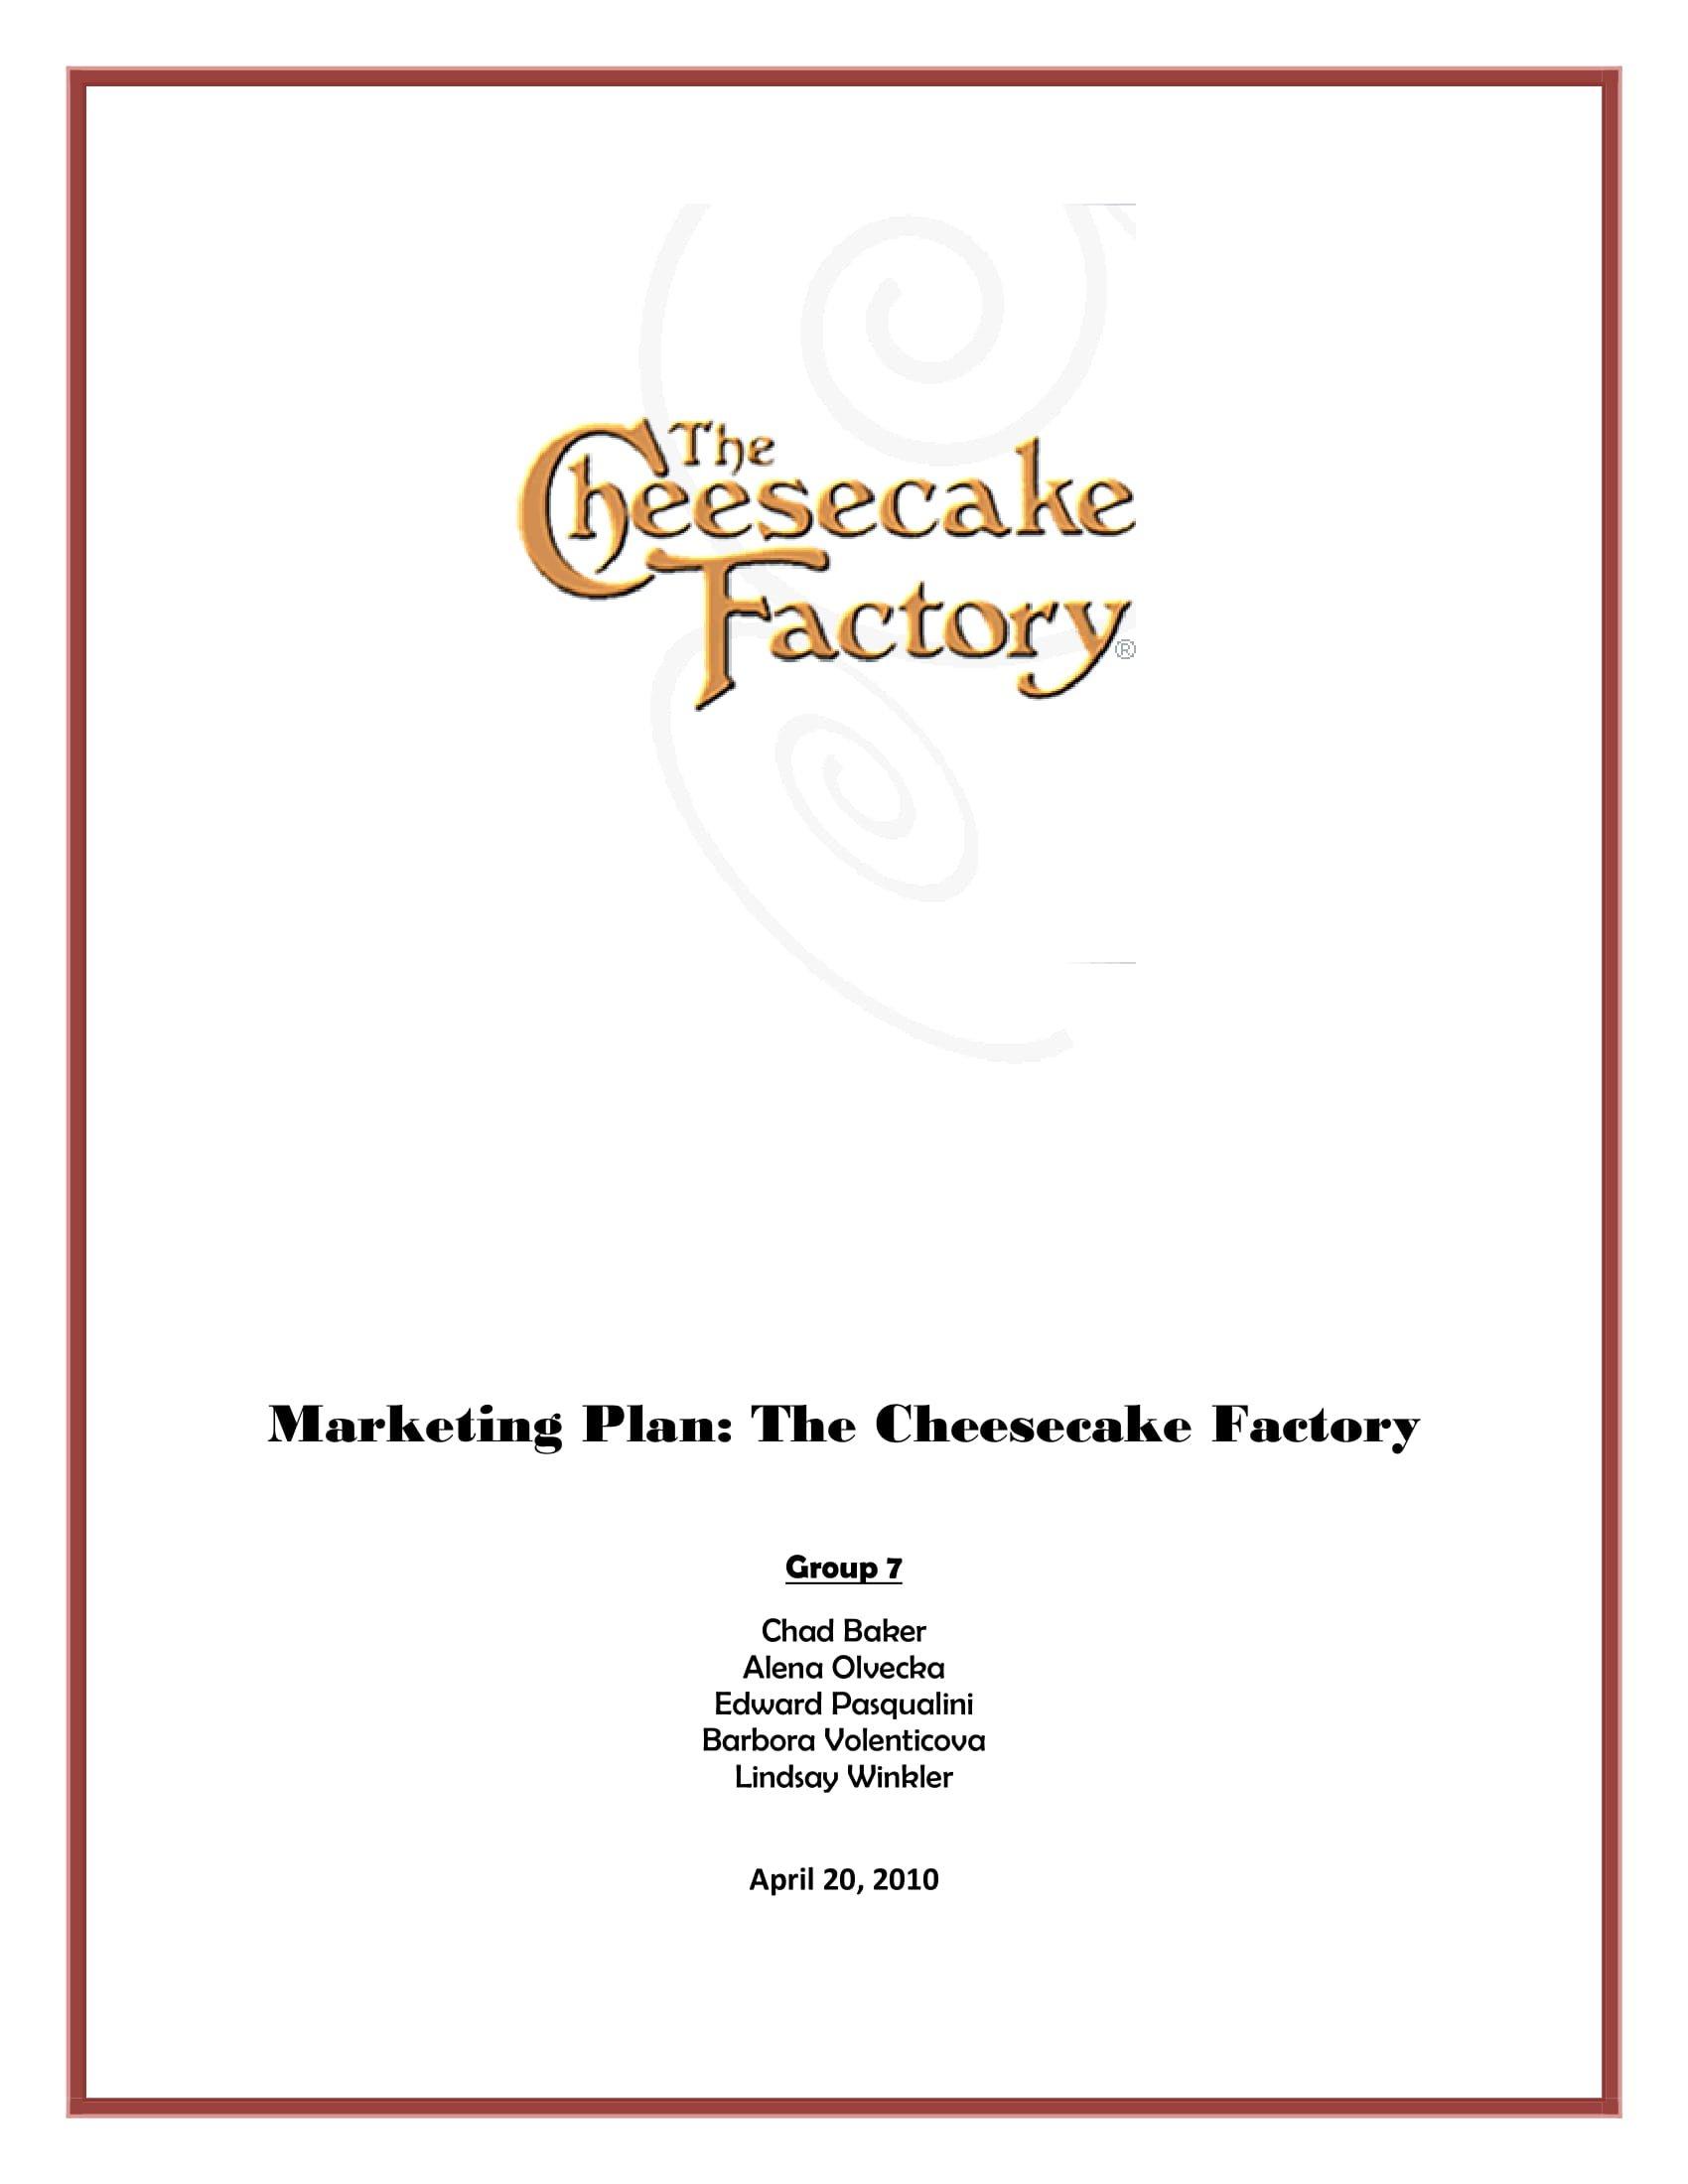 cheesecake factory marketing plan